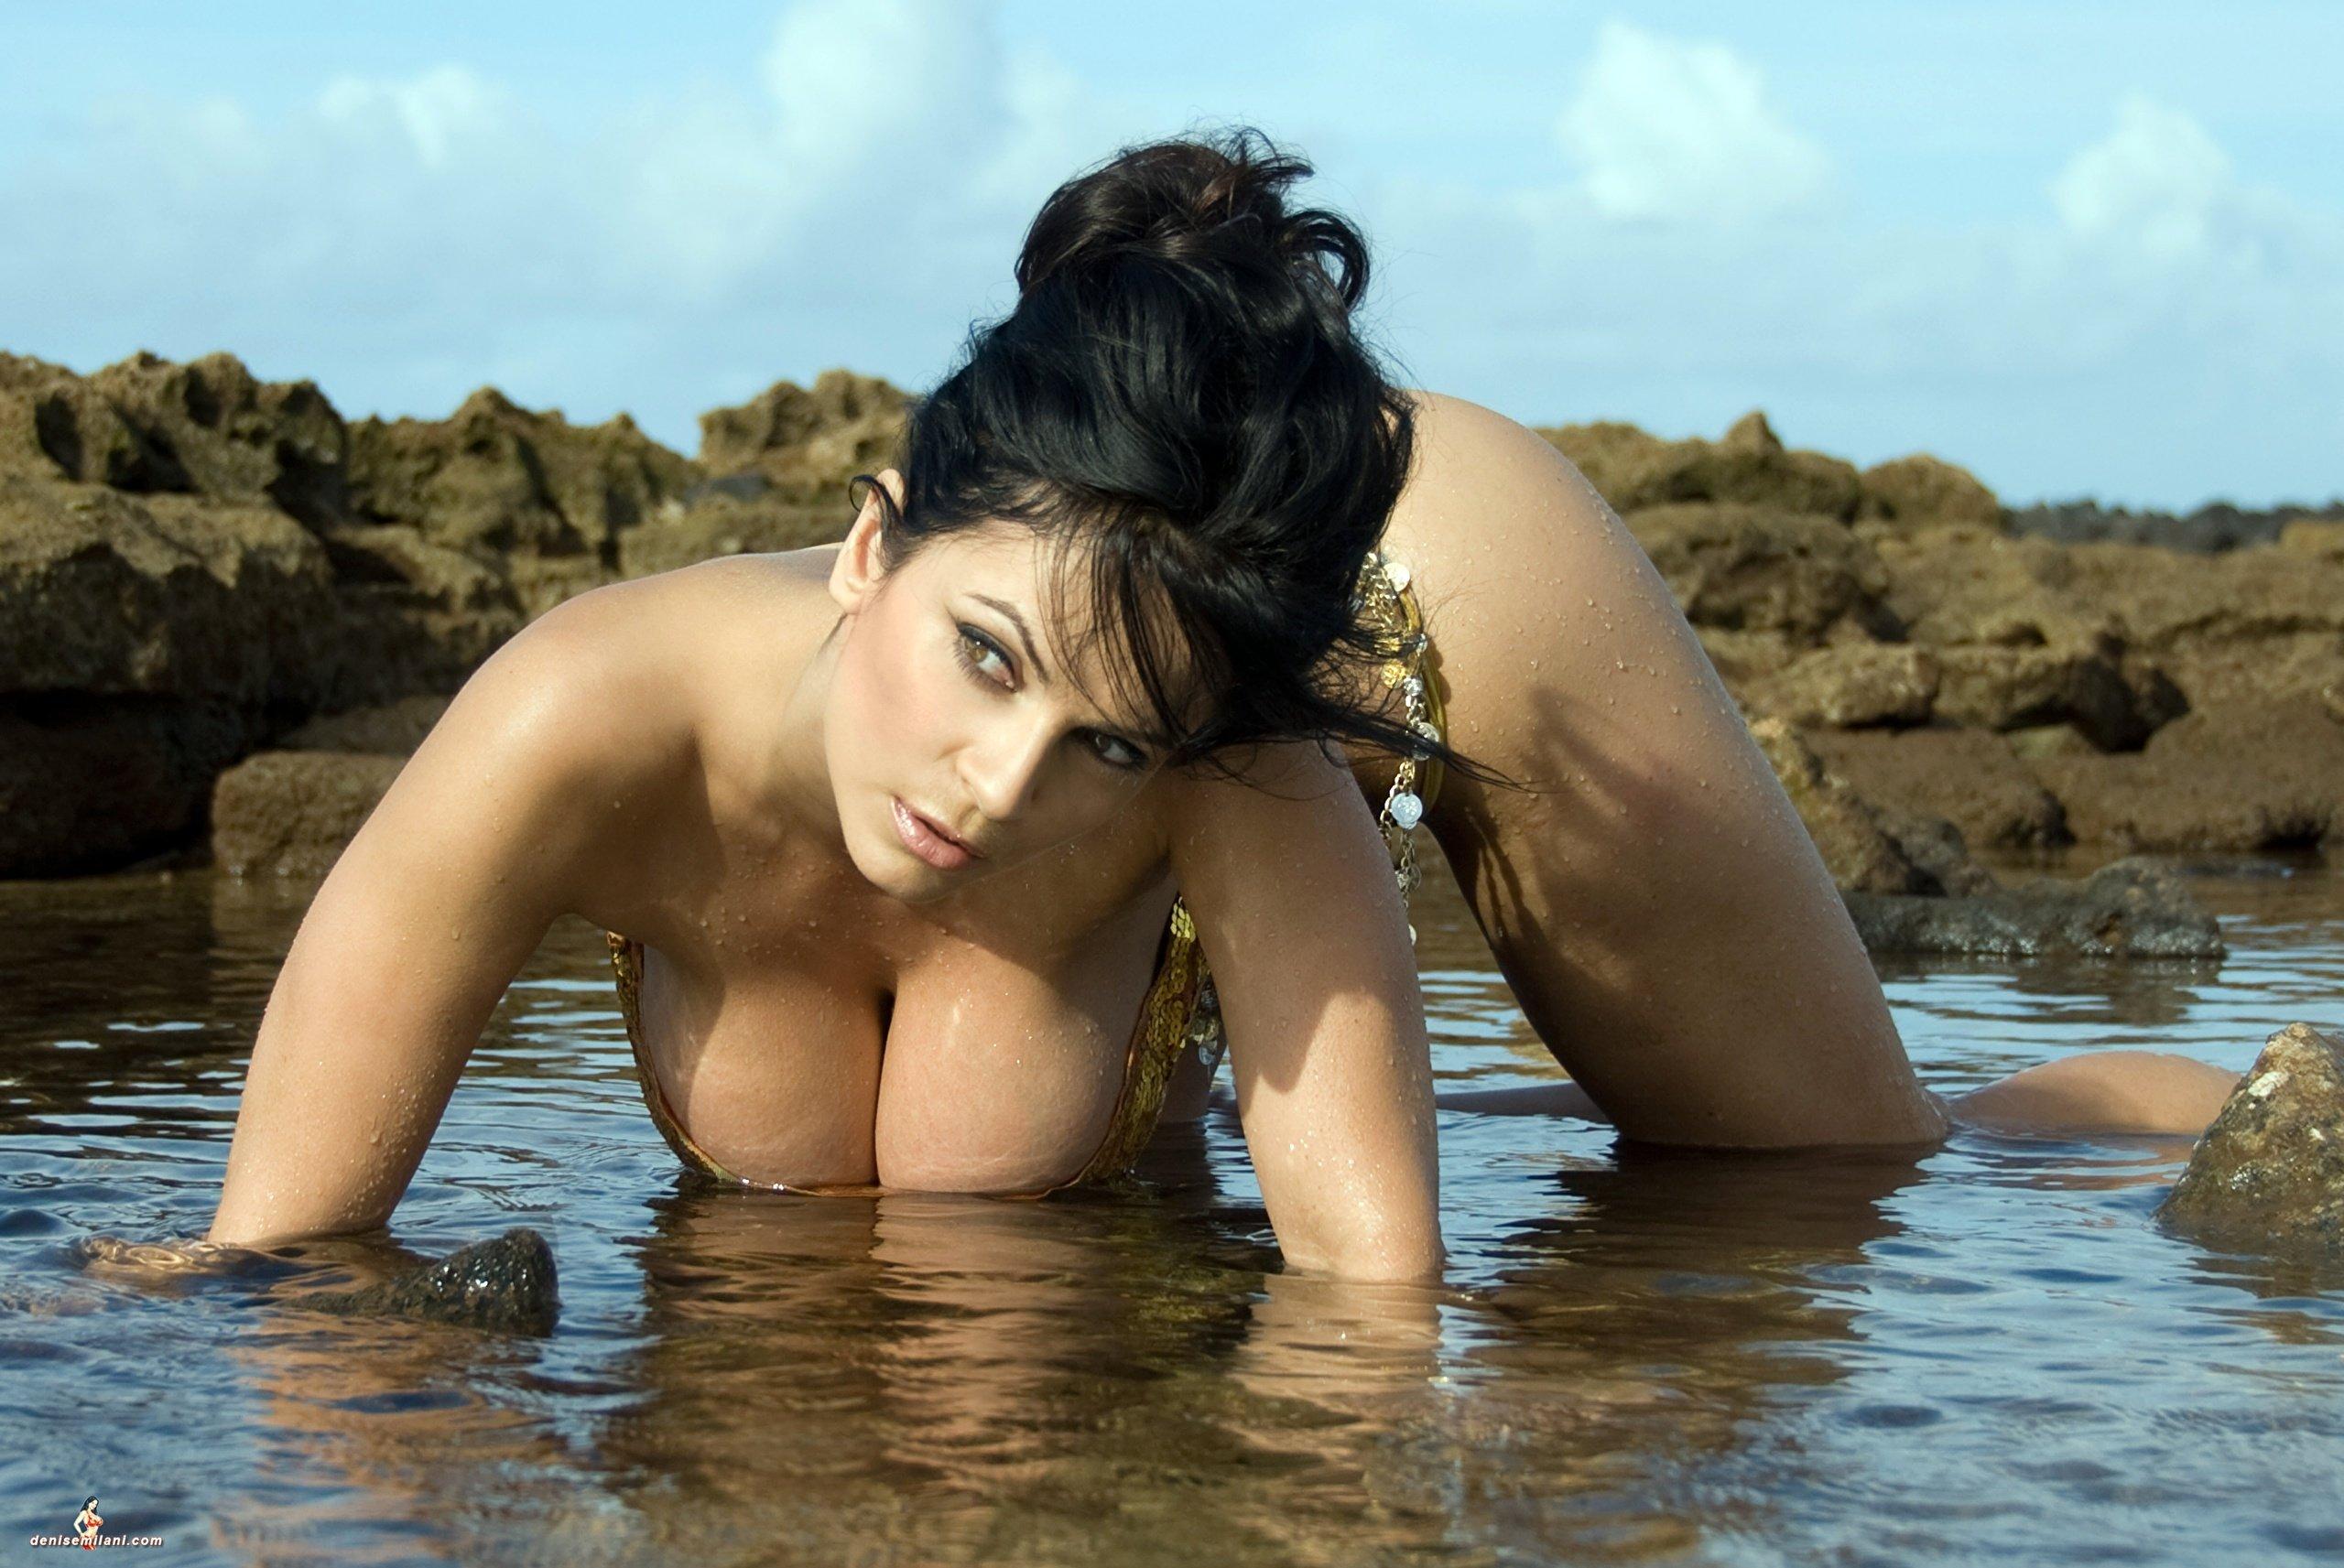 Milani nude denise Hot Photos